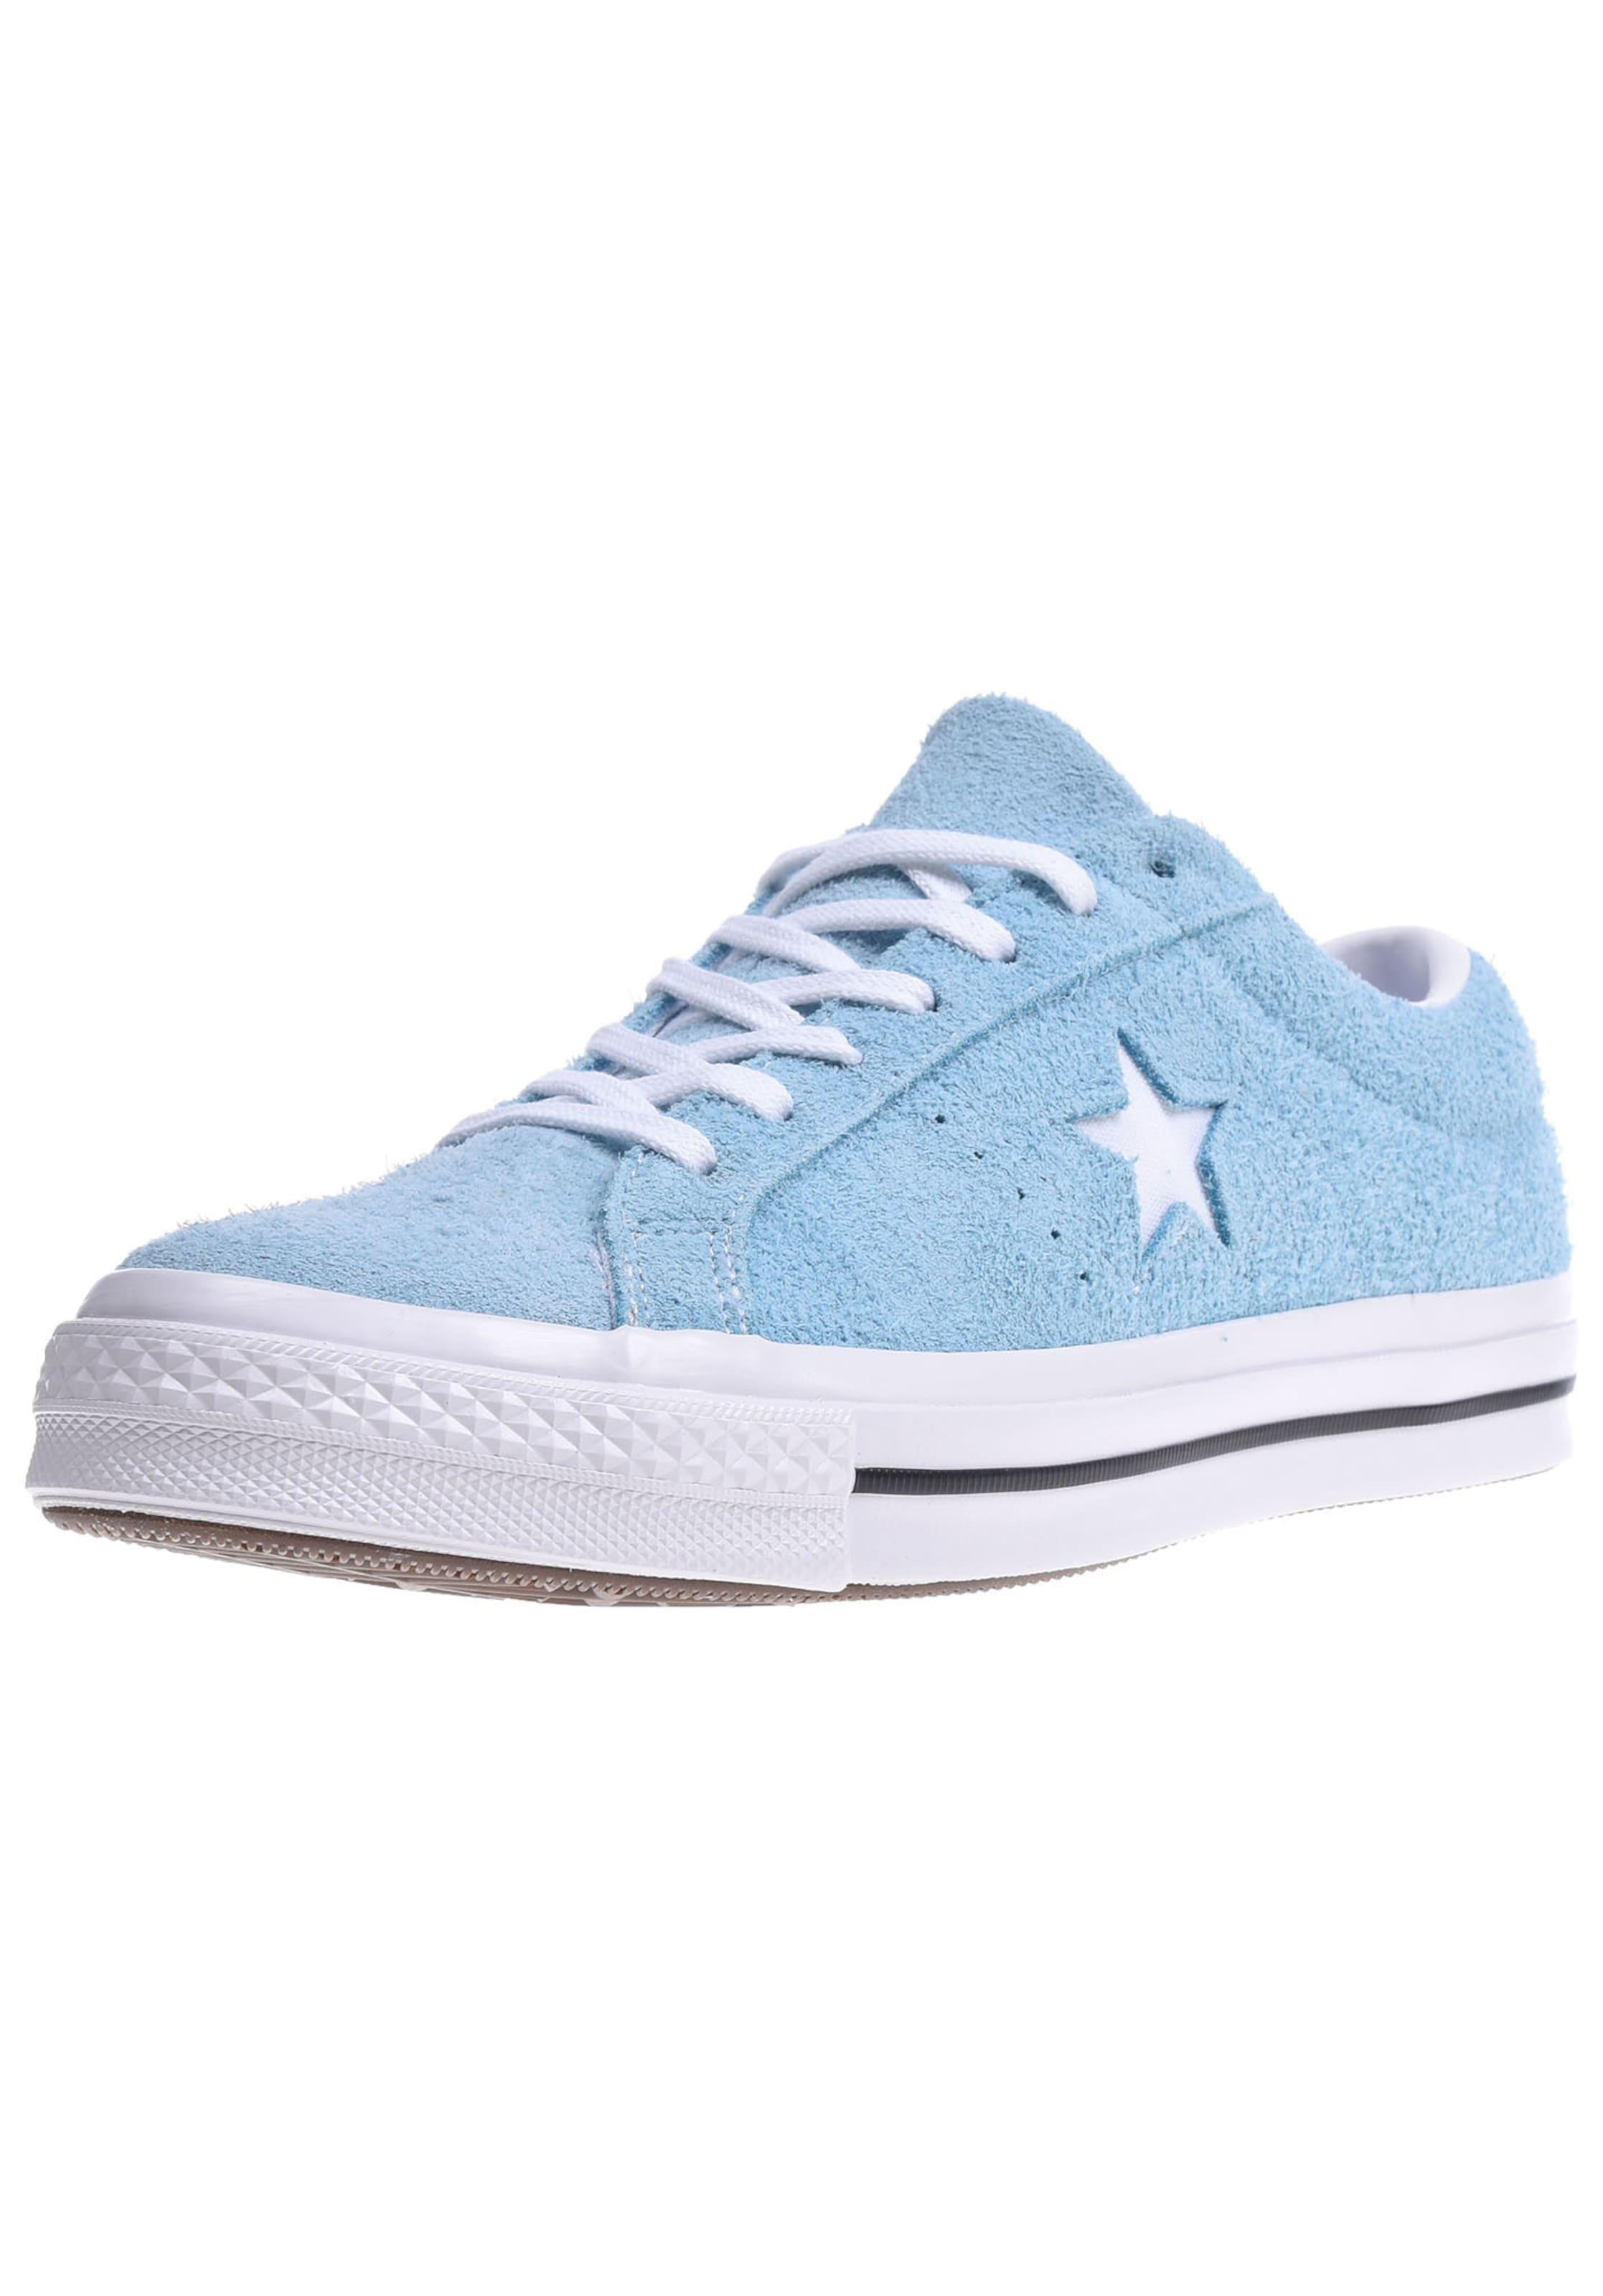 Shoreline' In Converse 'ox Sneaker Hellblau IYb7vmgy6f